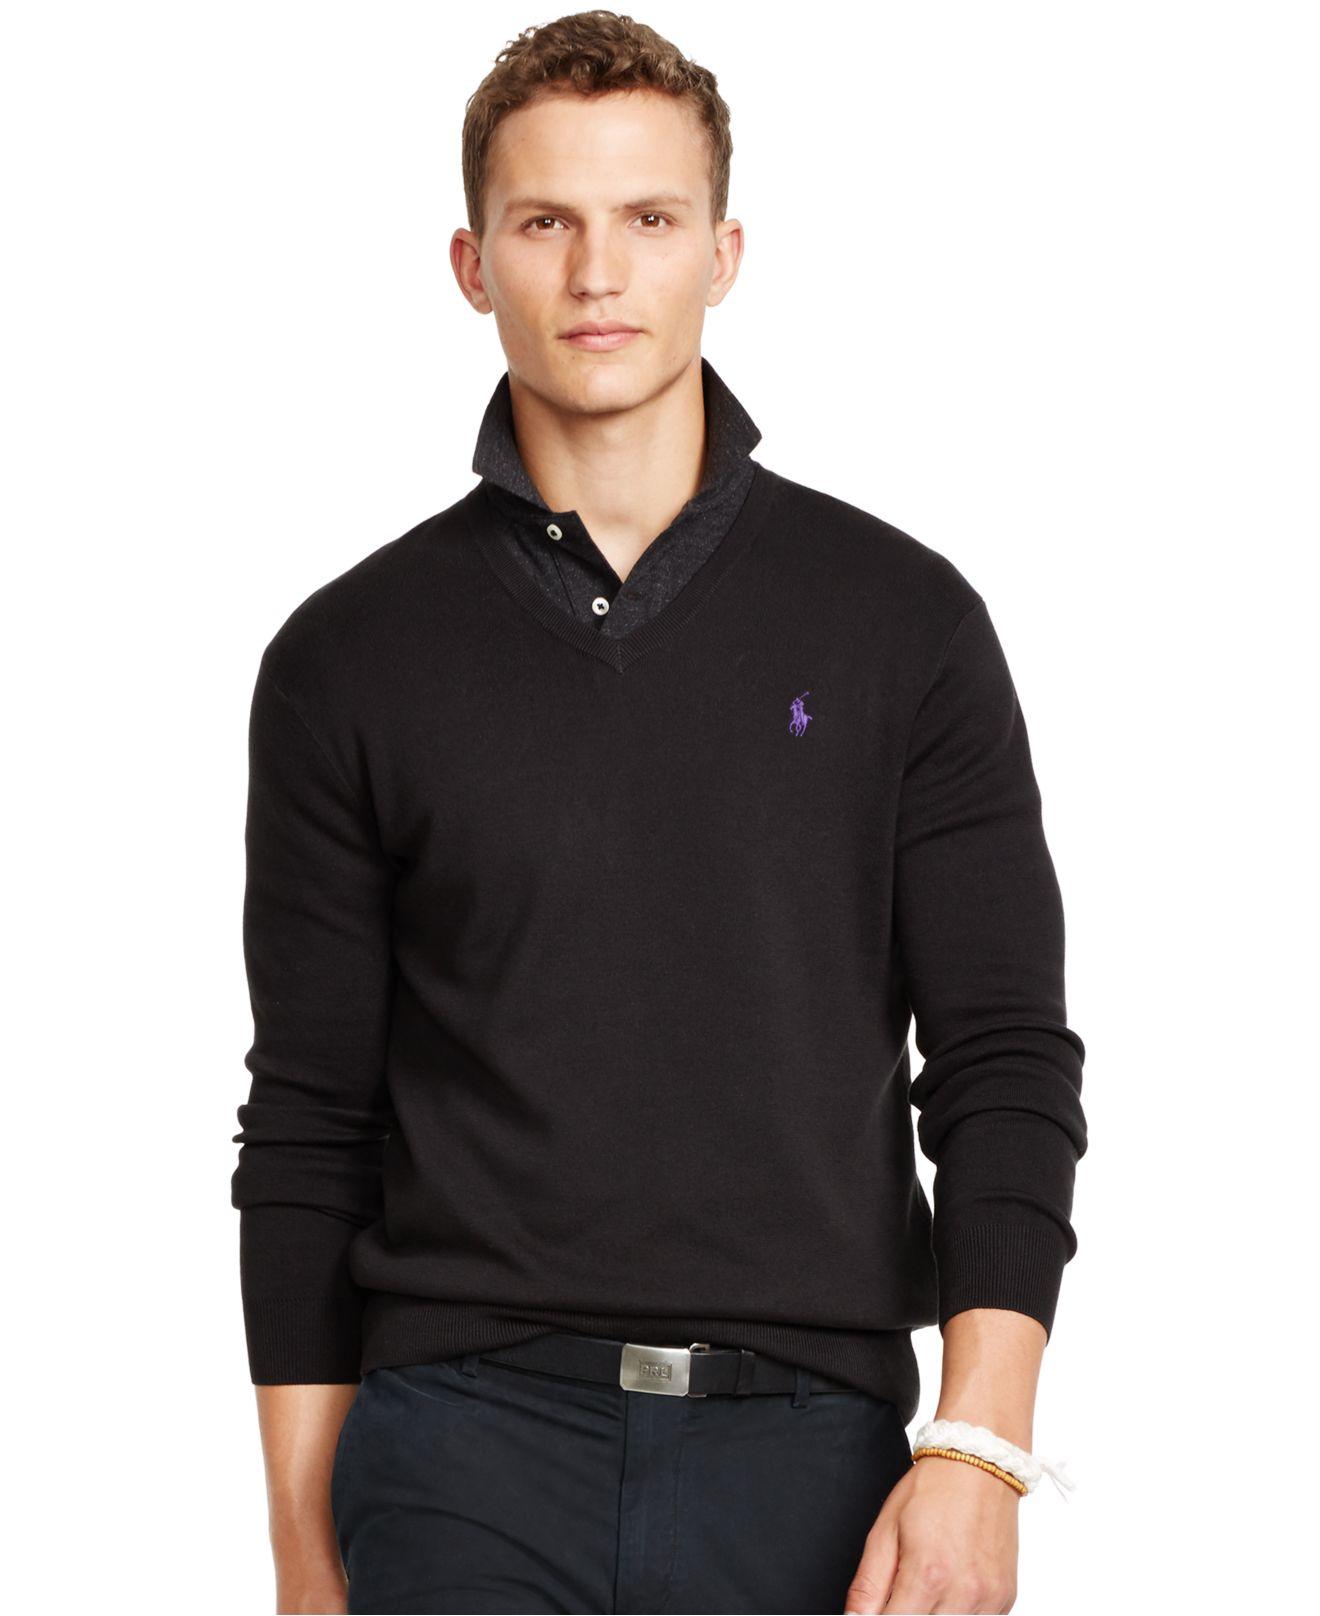 polo ralph lauren pima v neck sweater in black for men polo black lyst. Black Bedroom Furniture Sets. Home Design Ideas